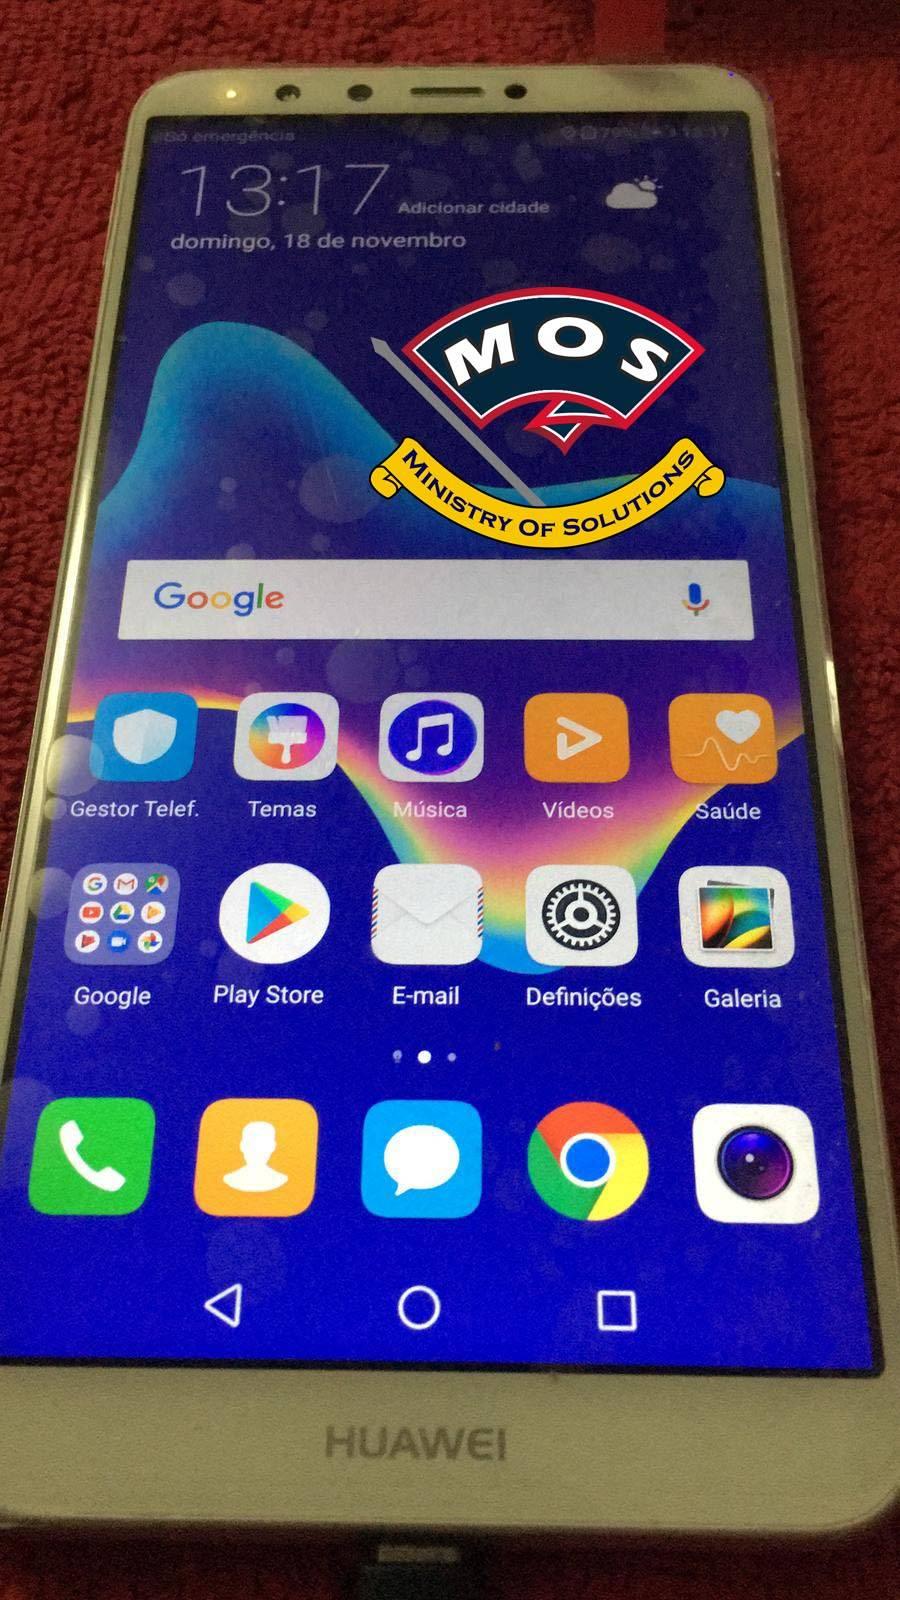 Huawei Y9 2018 FLA-AL00, FLA-AL10, FLA-AL20 Rebrand (Chinese